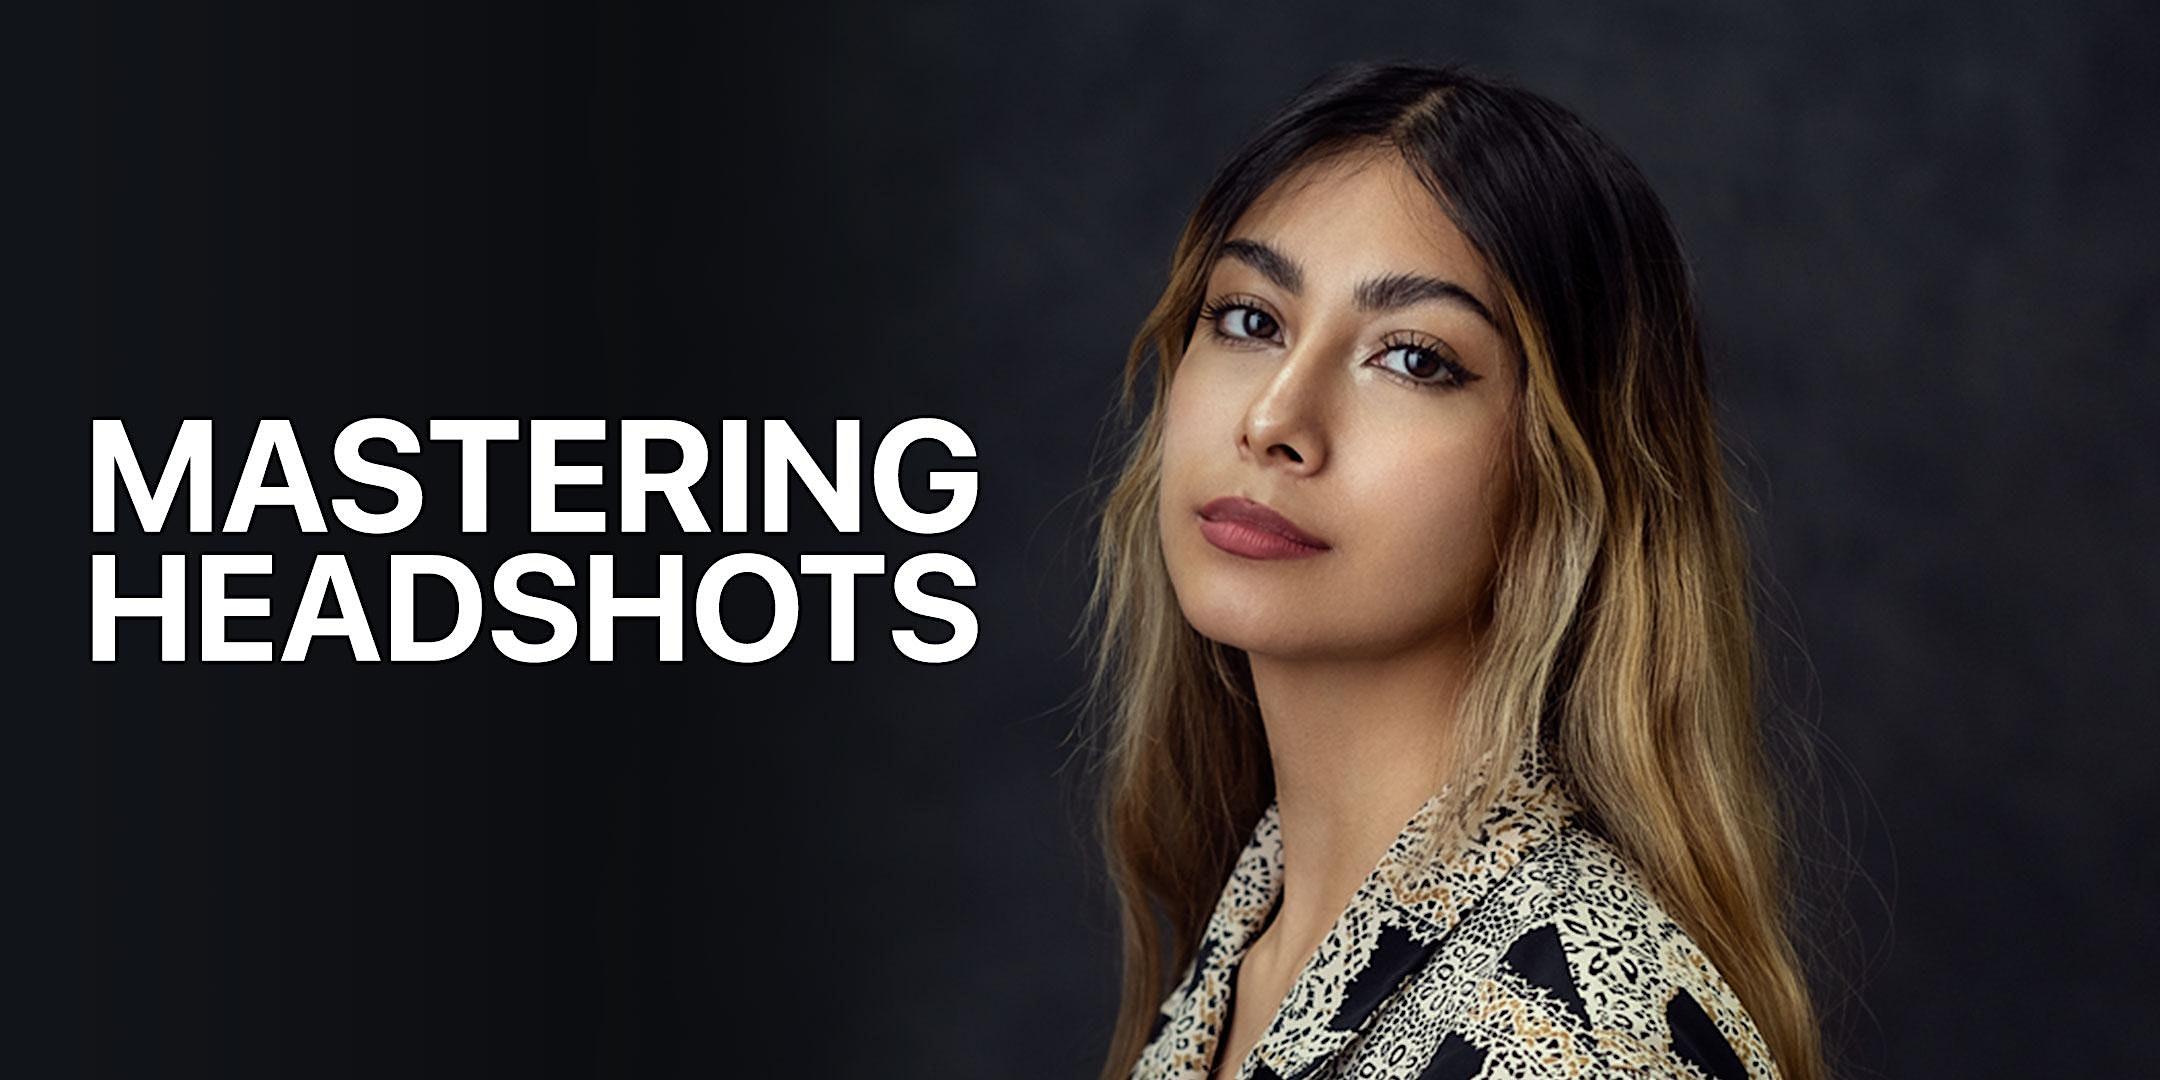 Mastering Headshots